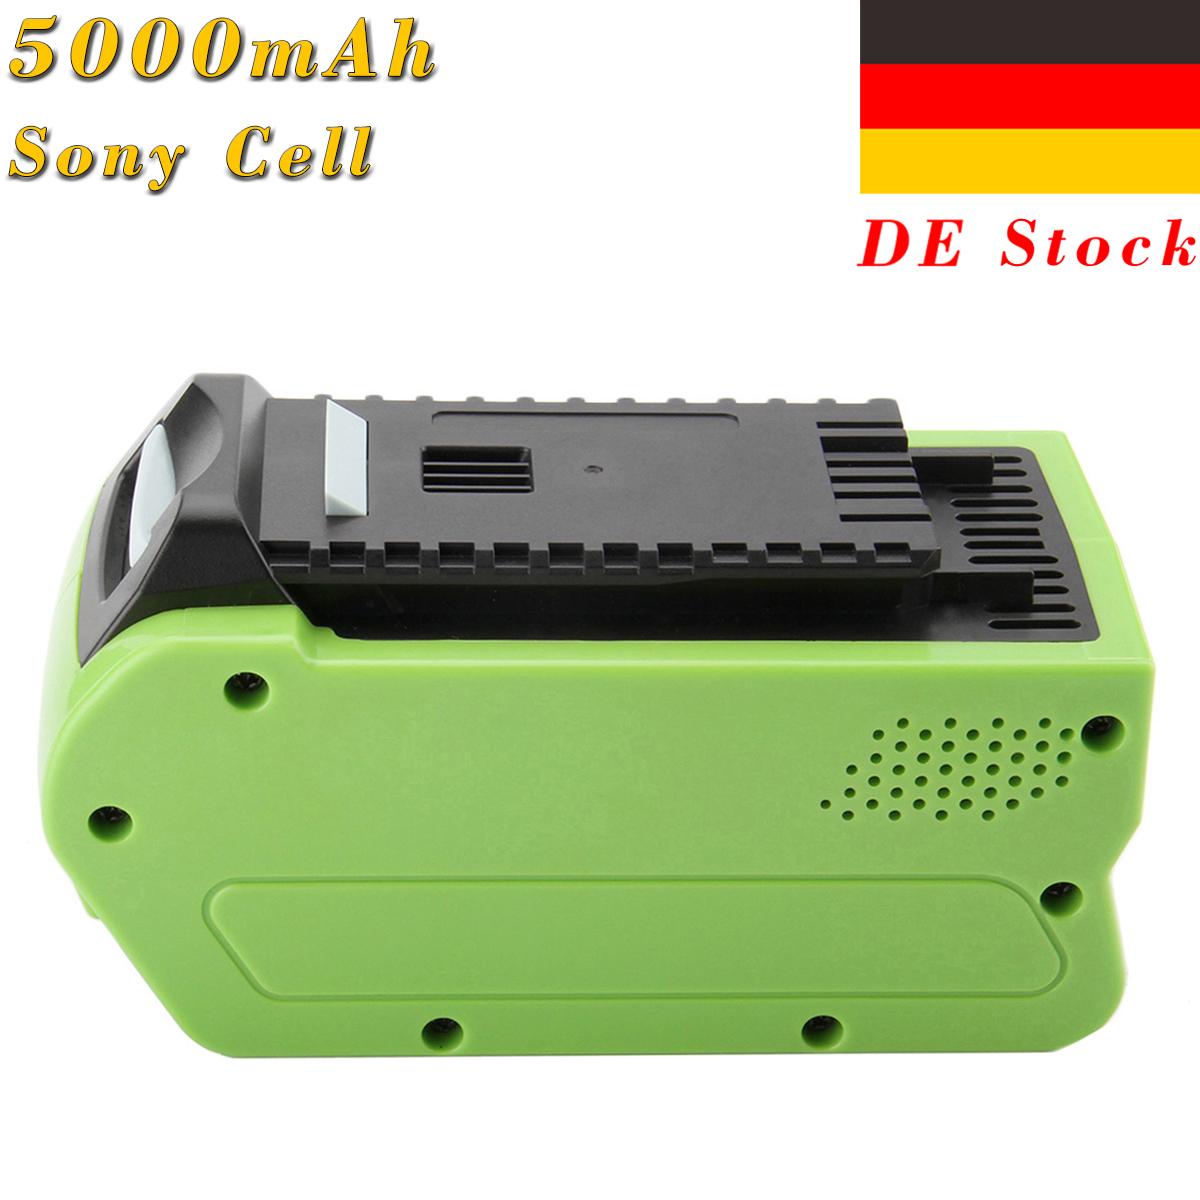 Für GreenWorks G-MAX 29472 26272 24252 21332 29462  40V Li-ion Akku Ladegerät